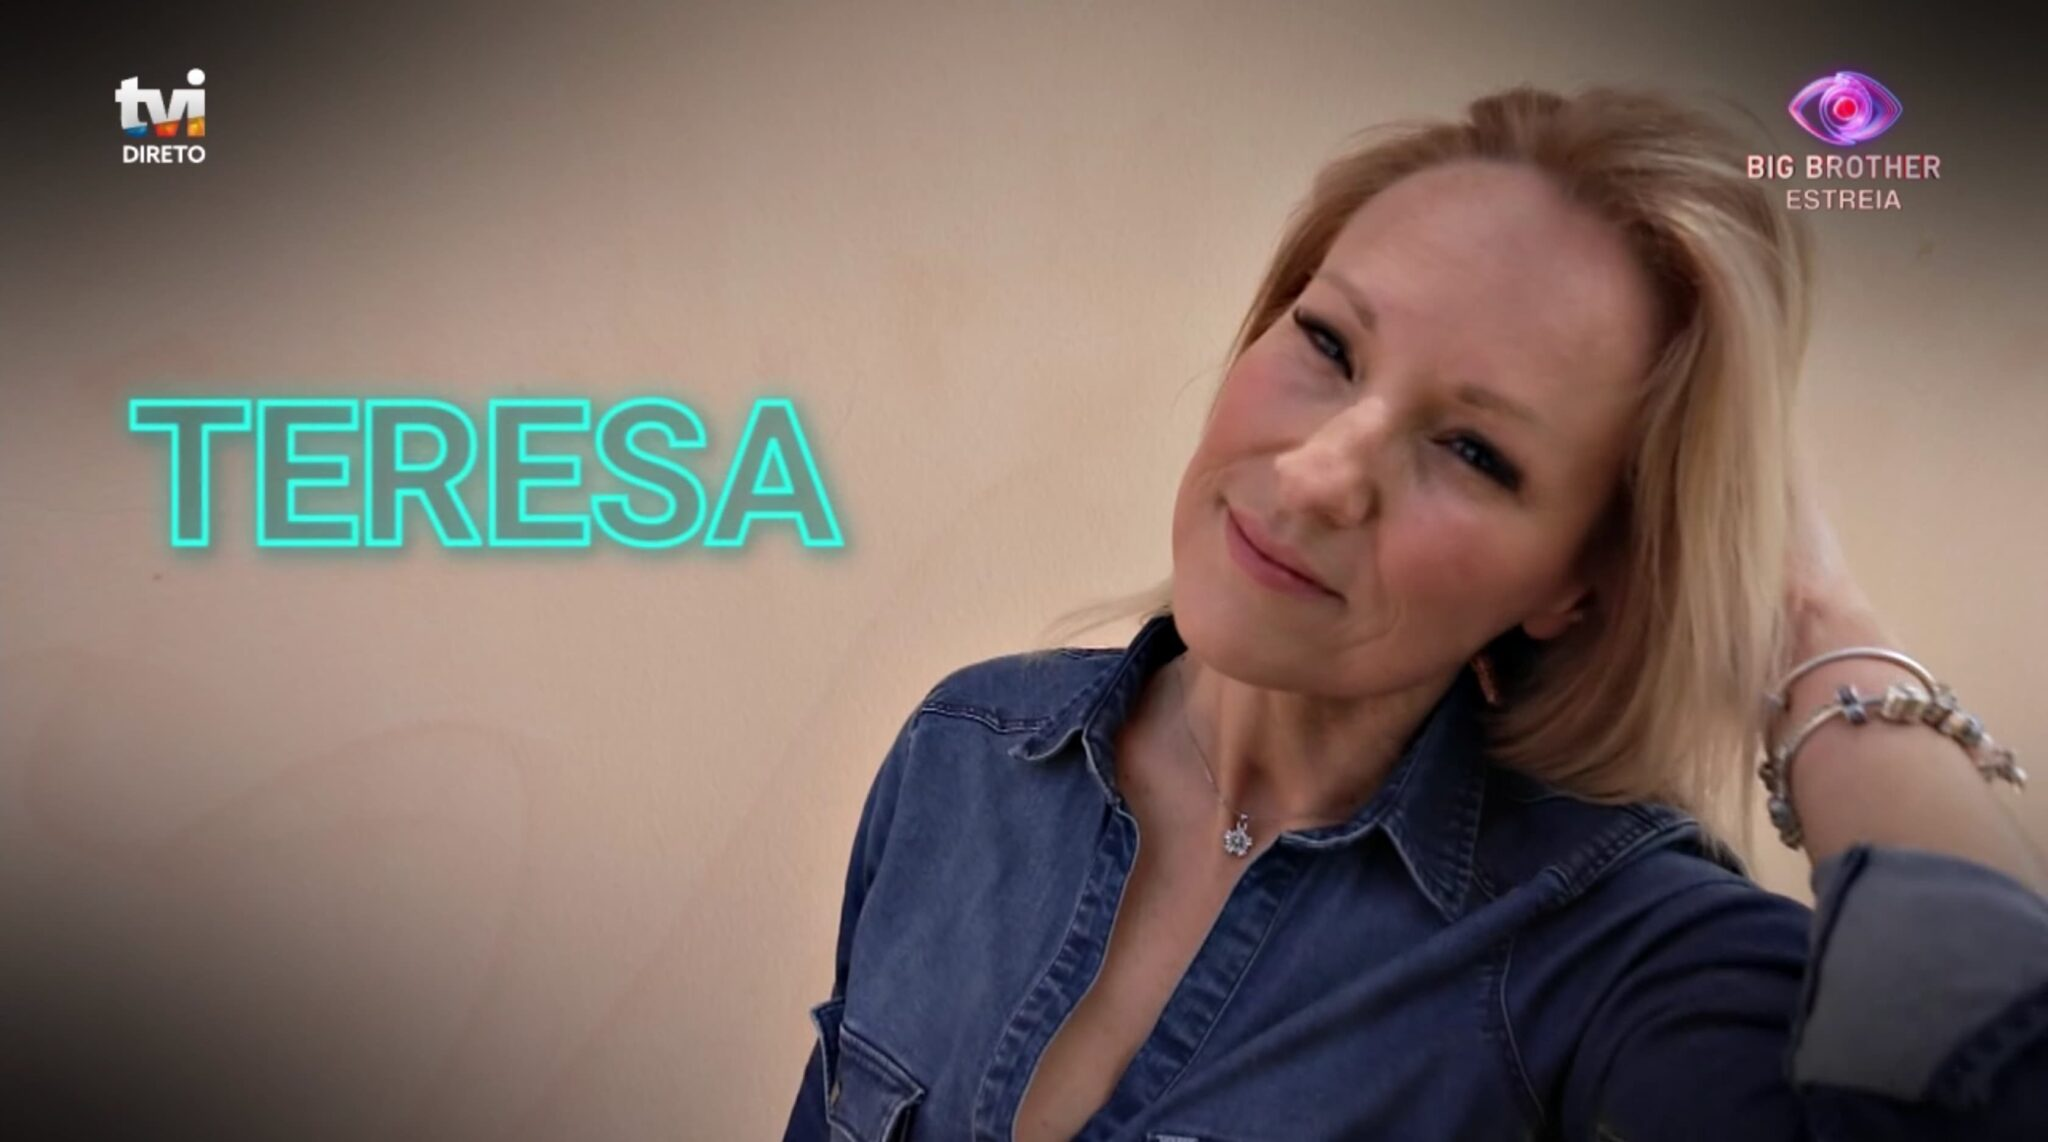 Teresa Big Brother Scaled Teresa E Renato. Conheça Os Novos Concorrentes Do Big Brother 2020